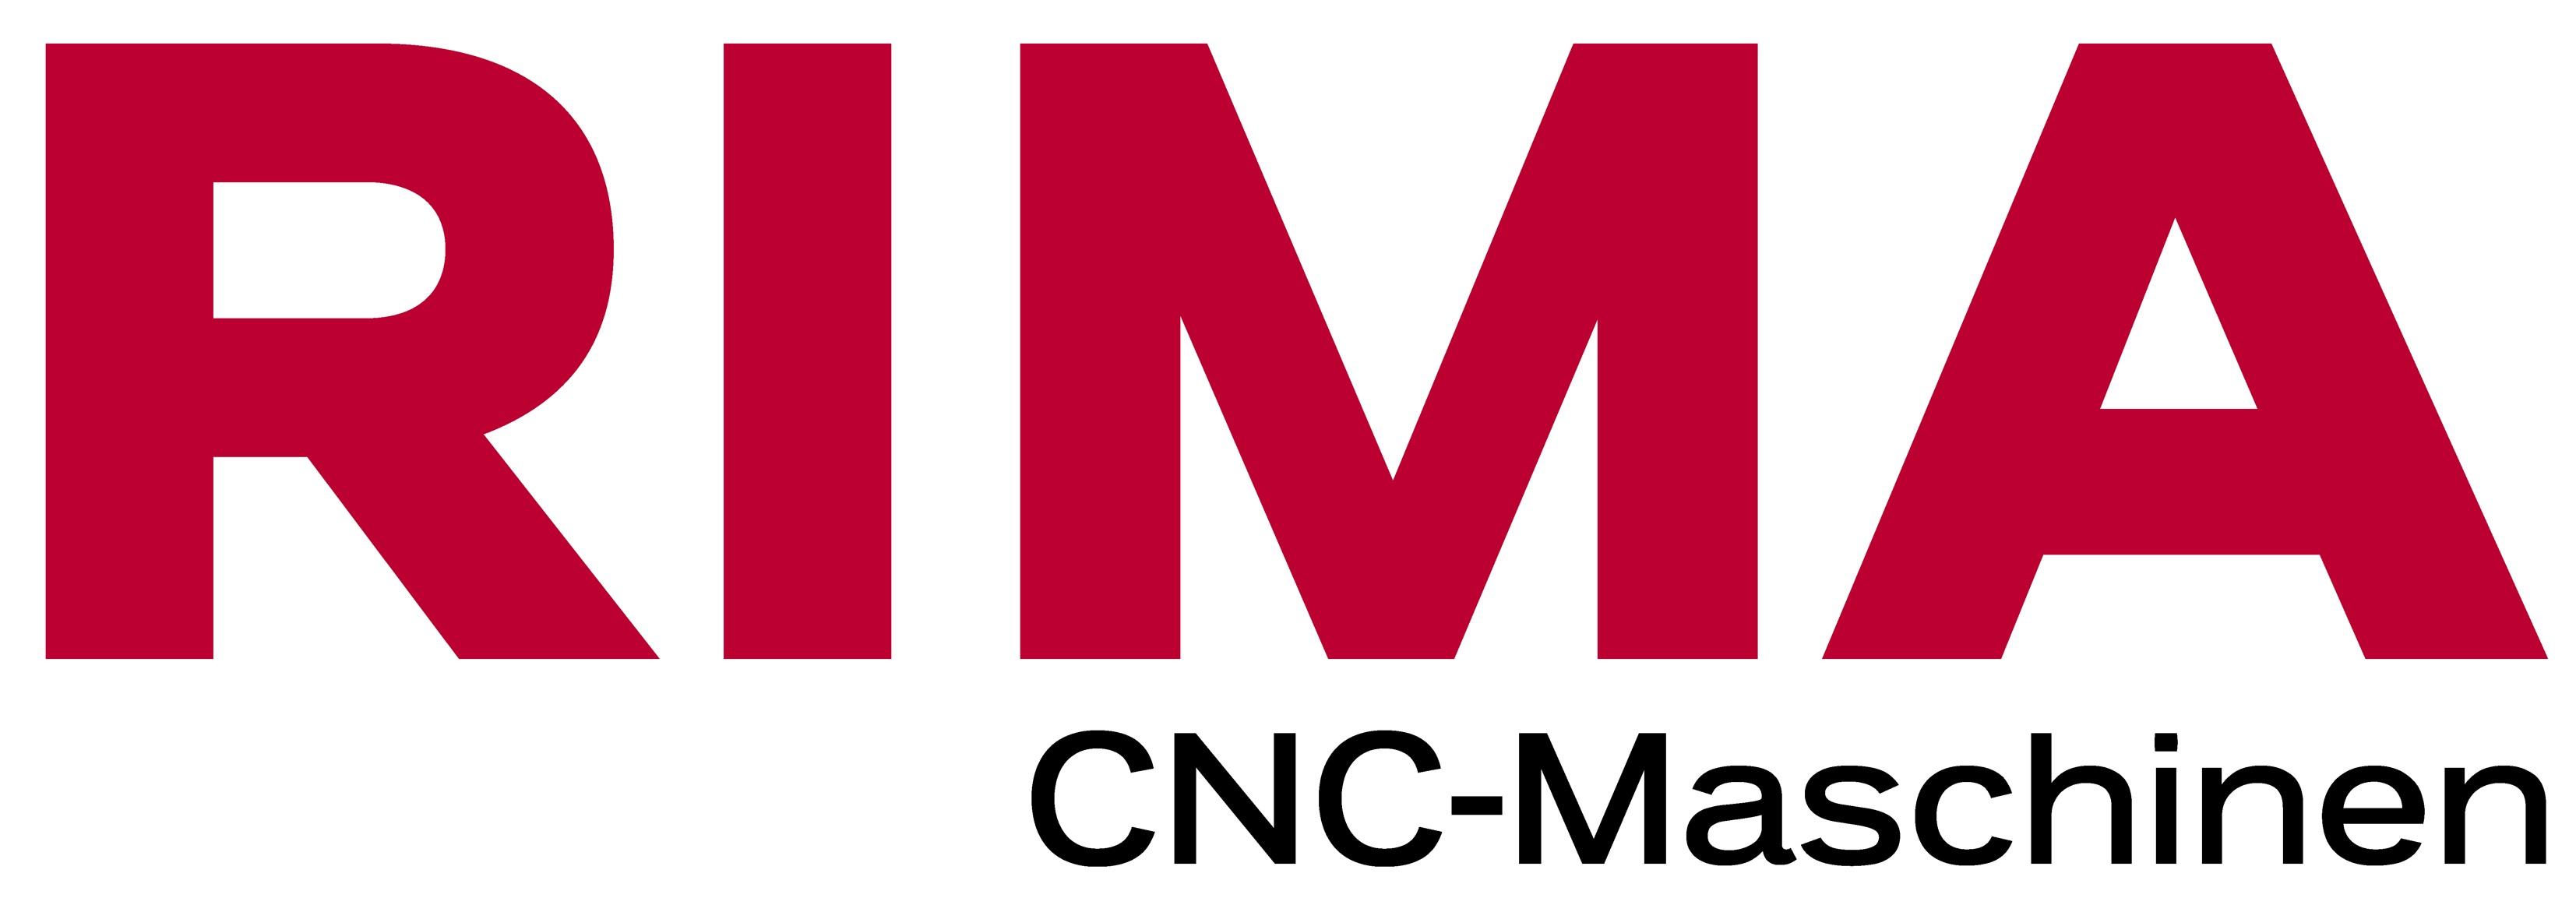 Rima-Logo.jpg